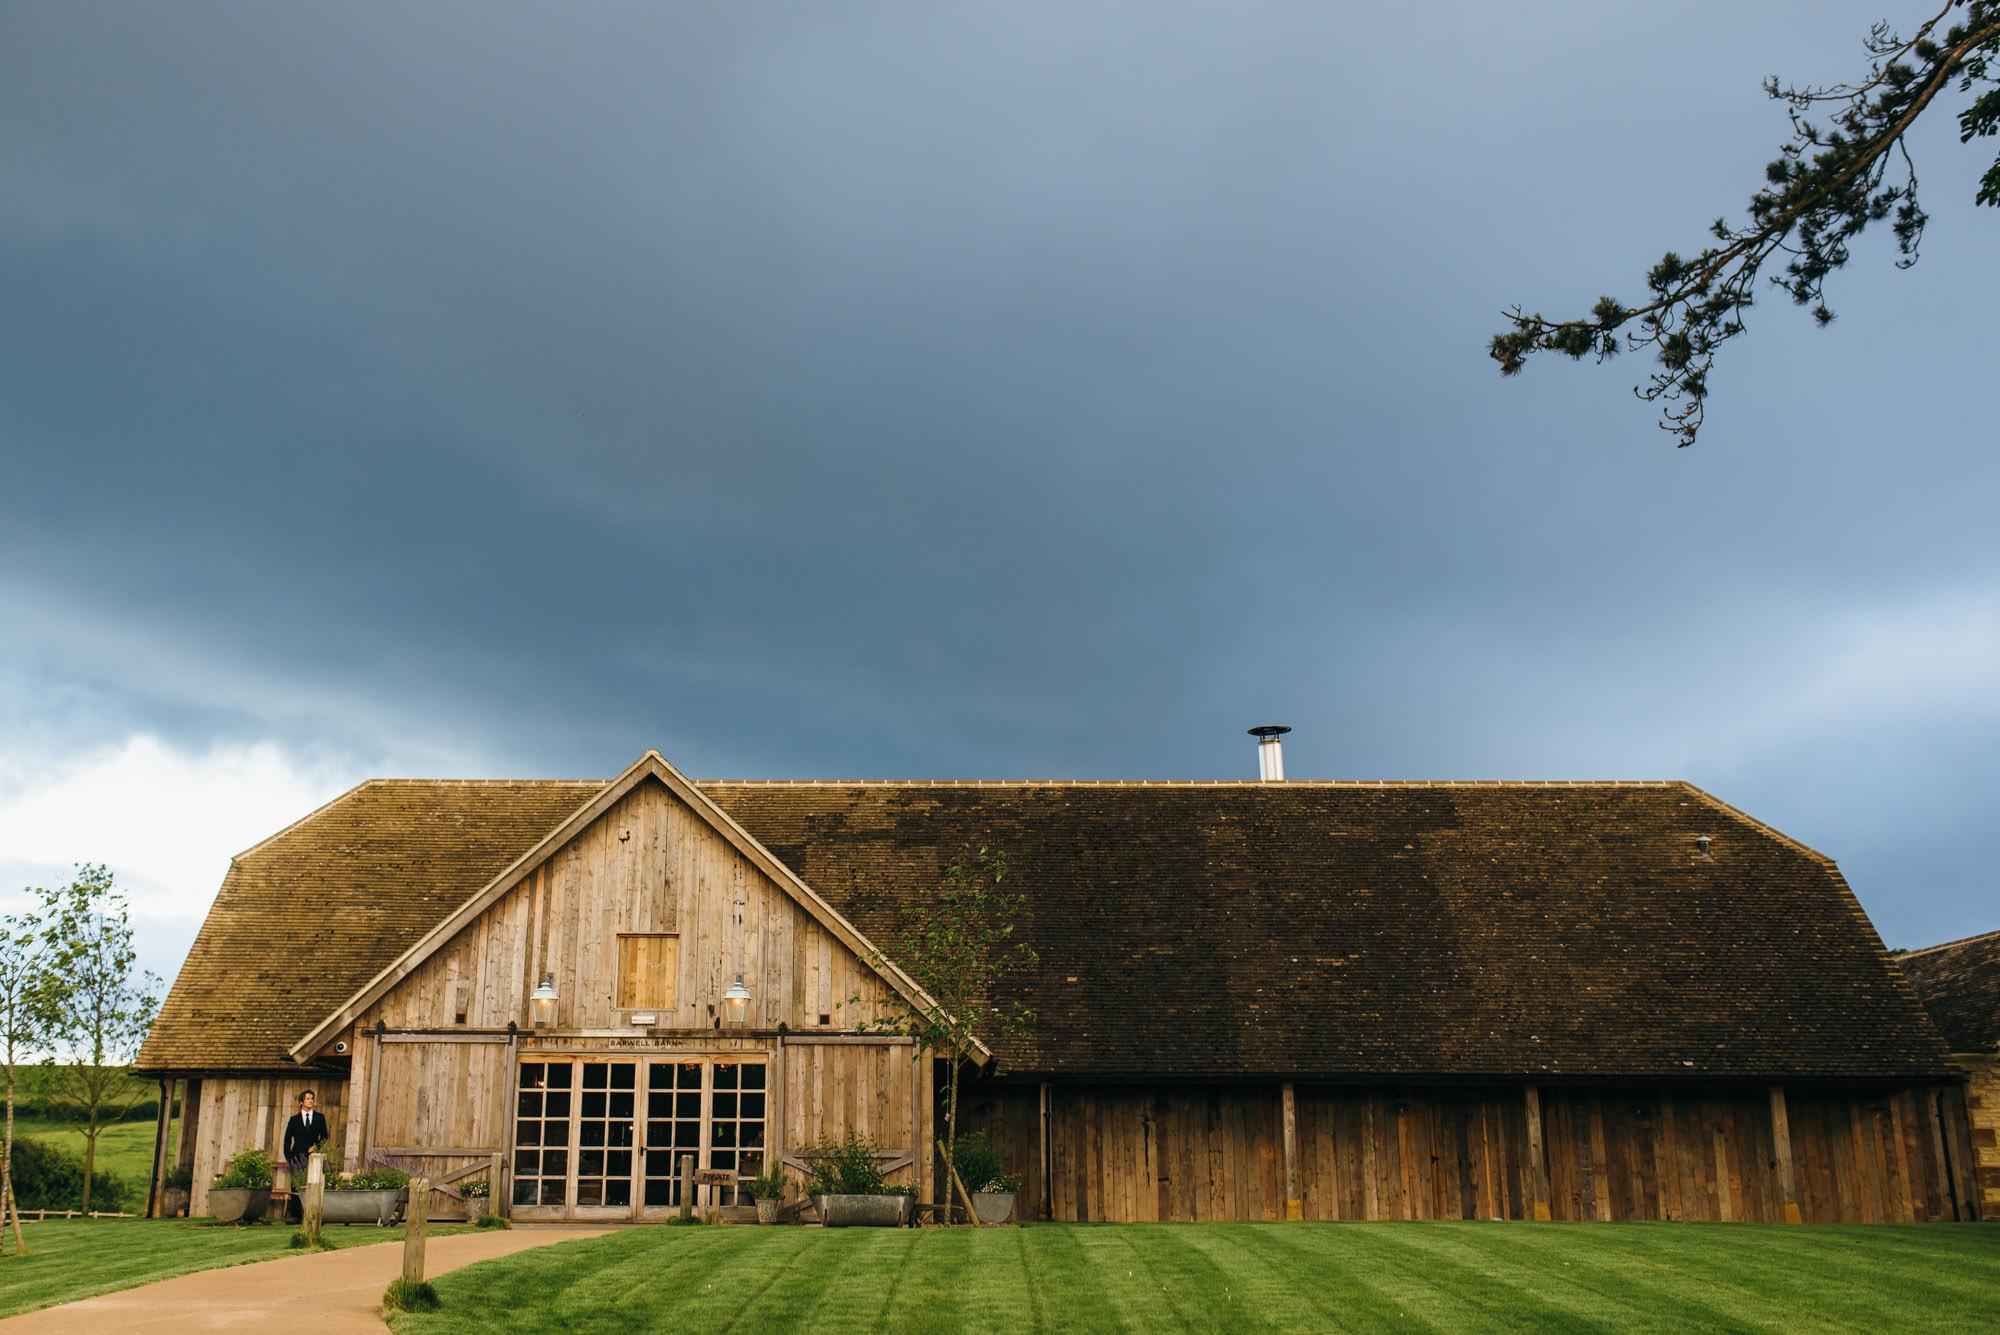 Soho farmhouse wedding venue